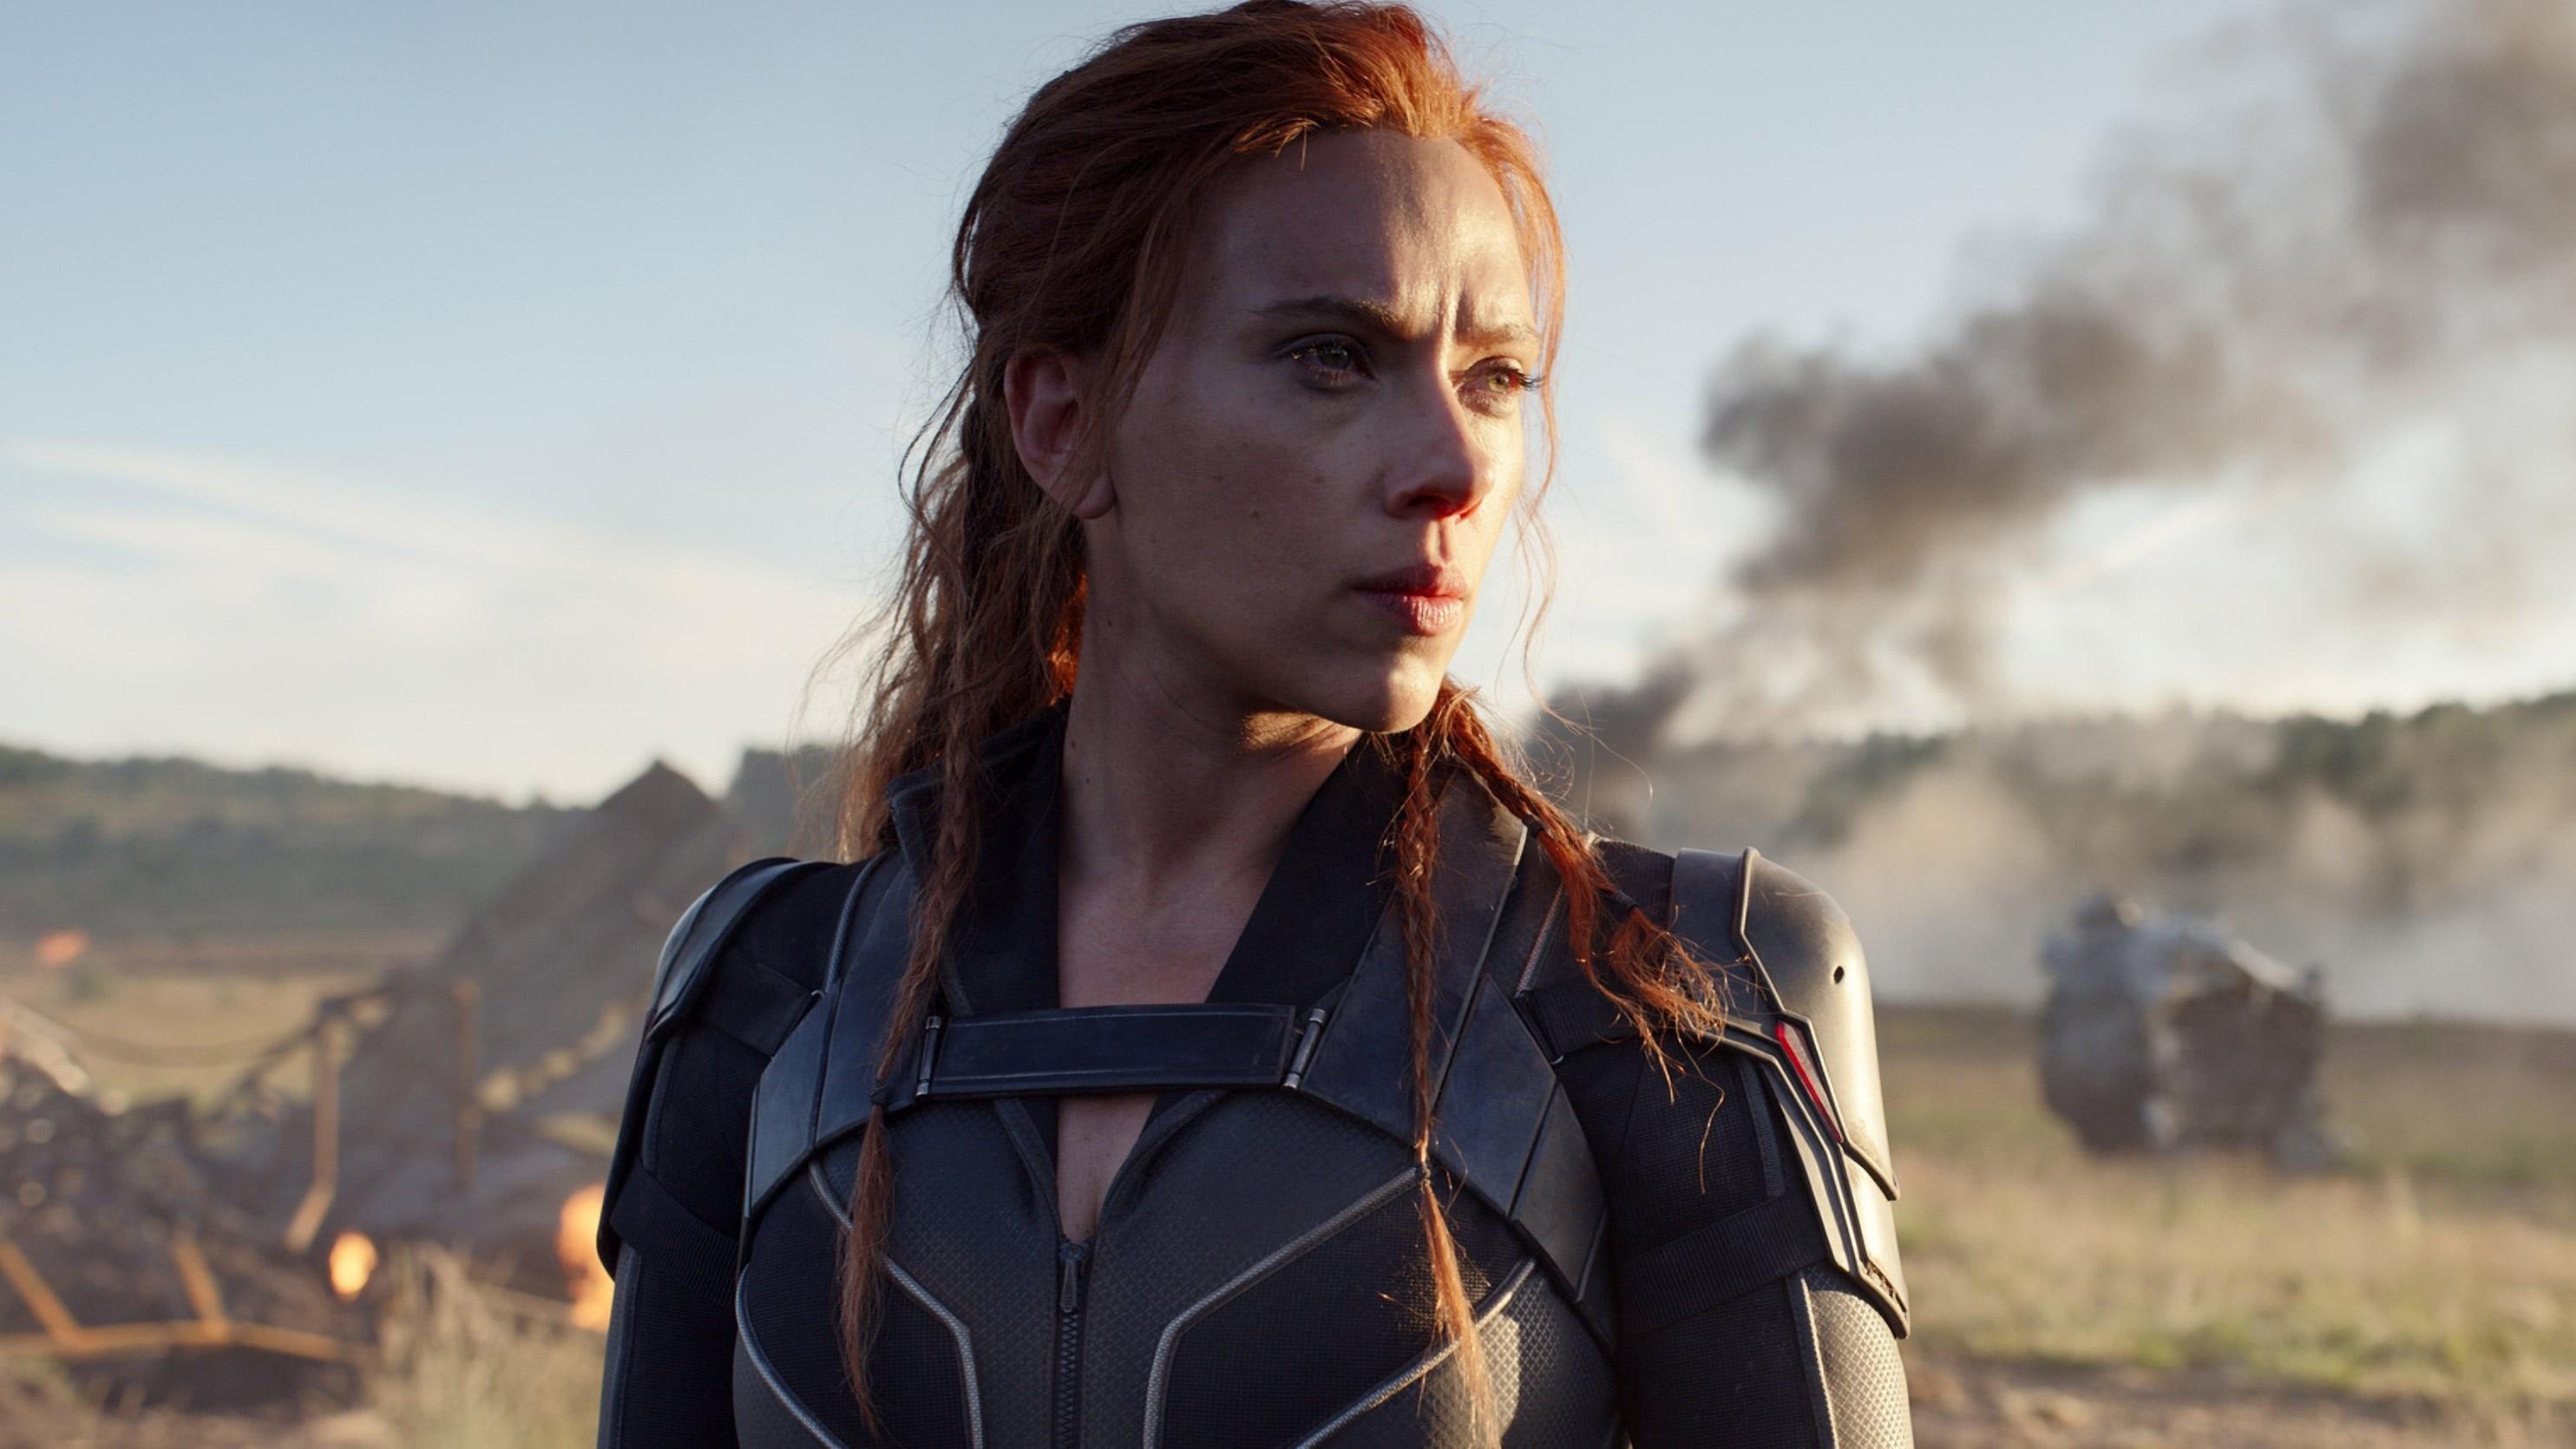 Black Widow looks into the distance in front of a fiery scene